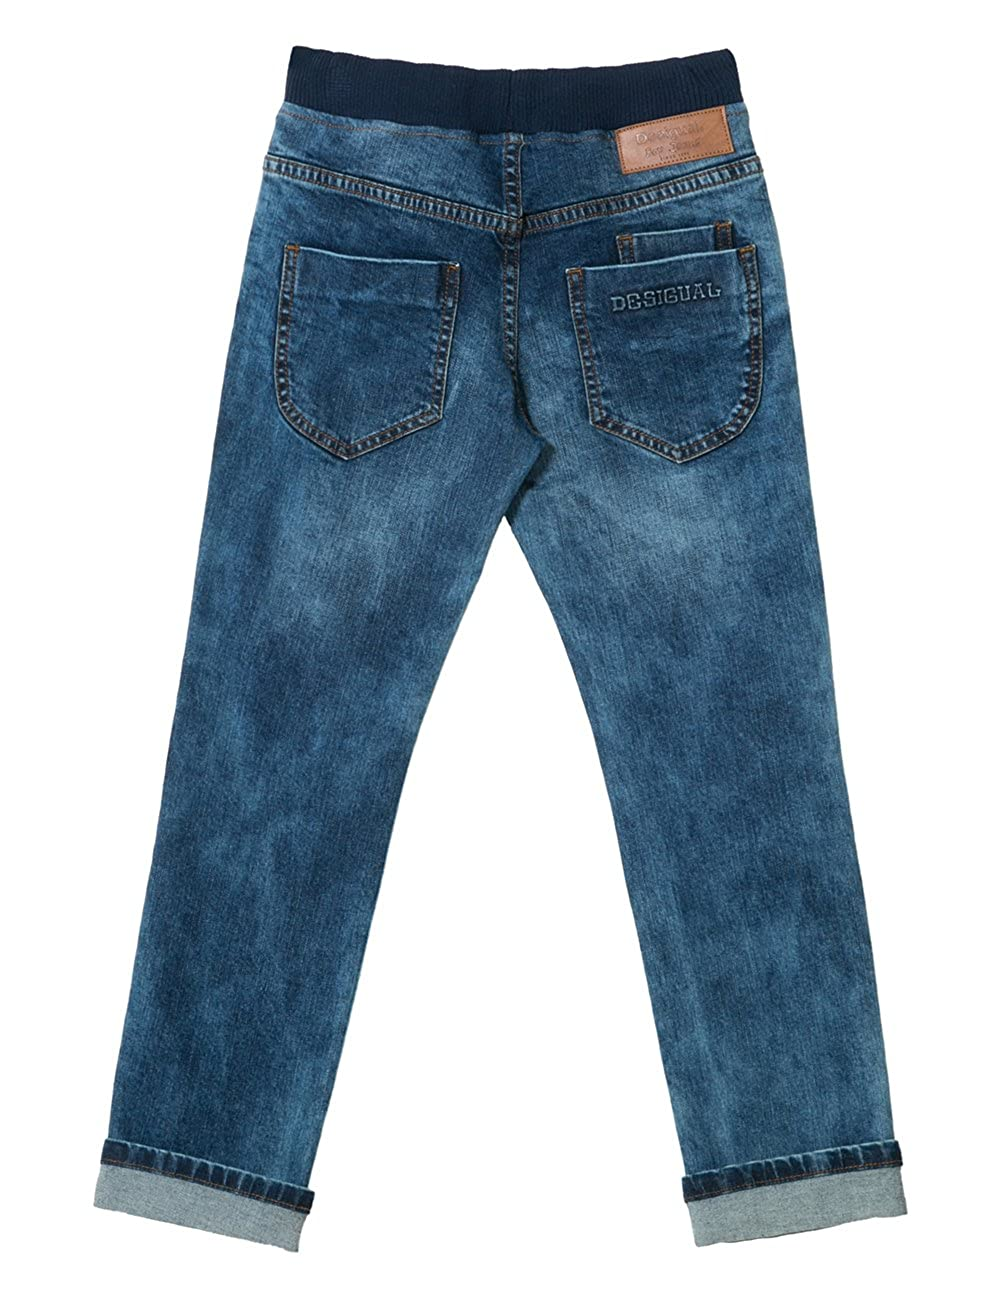 Jeans Bambino Desigual Denim/_parches